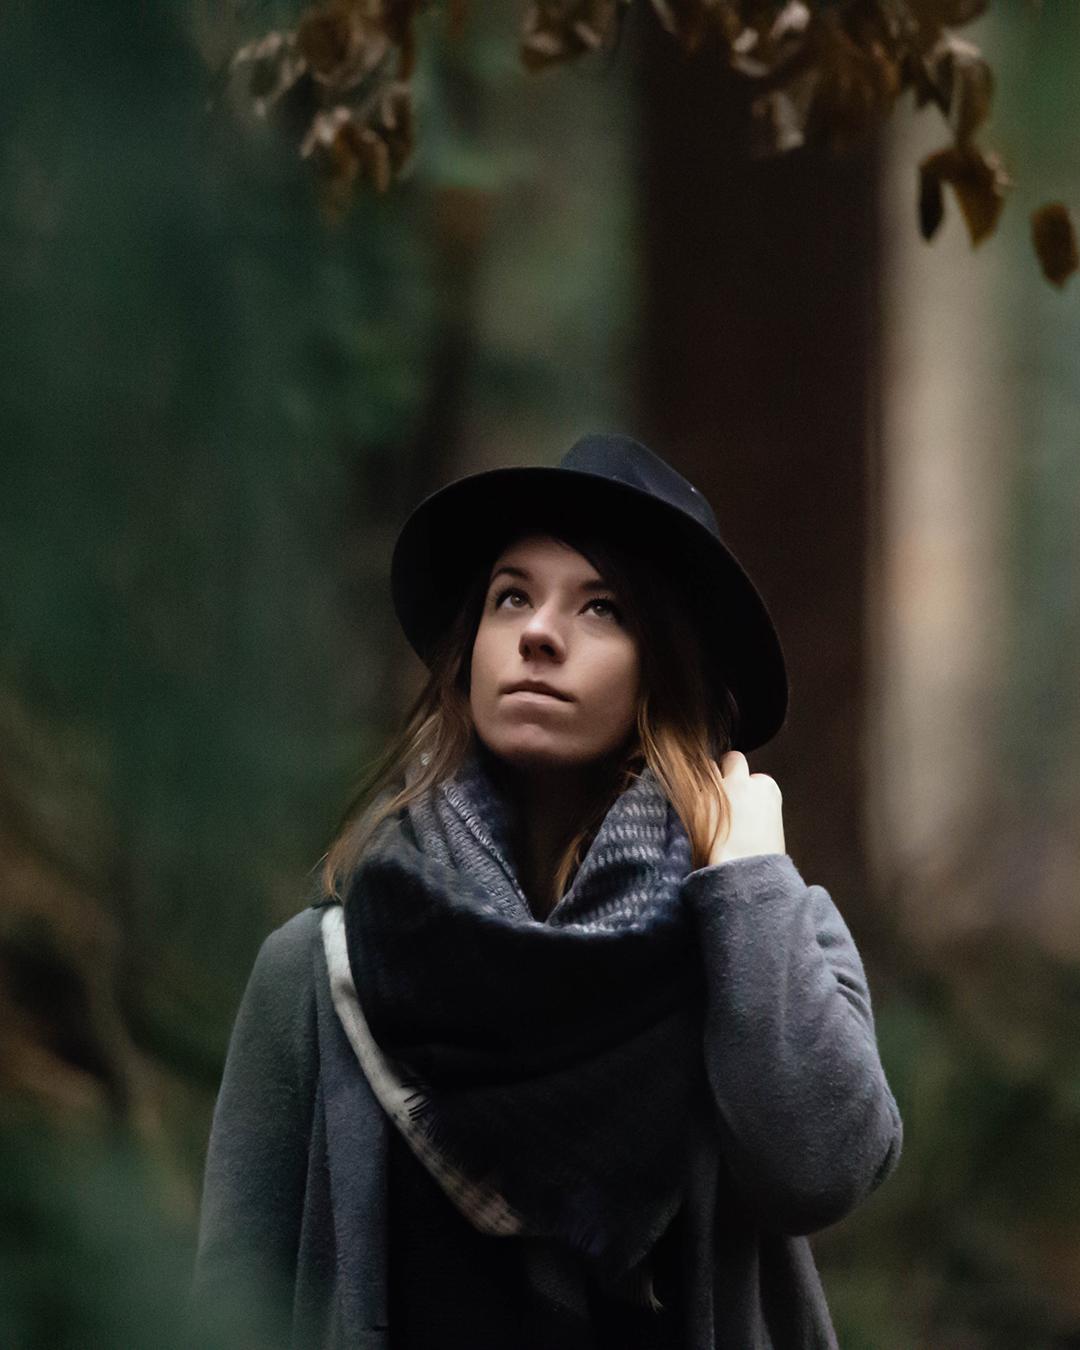 olivia-thefrenchoutdoors-instameet-instagram-photographe-outdoors-aventure-bivouac-2